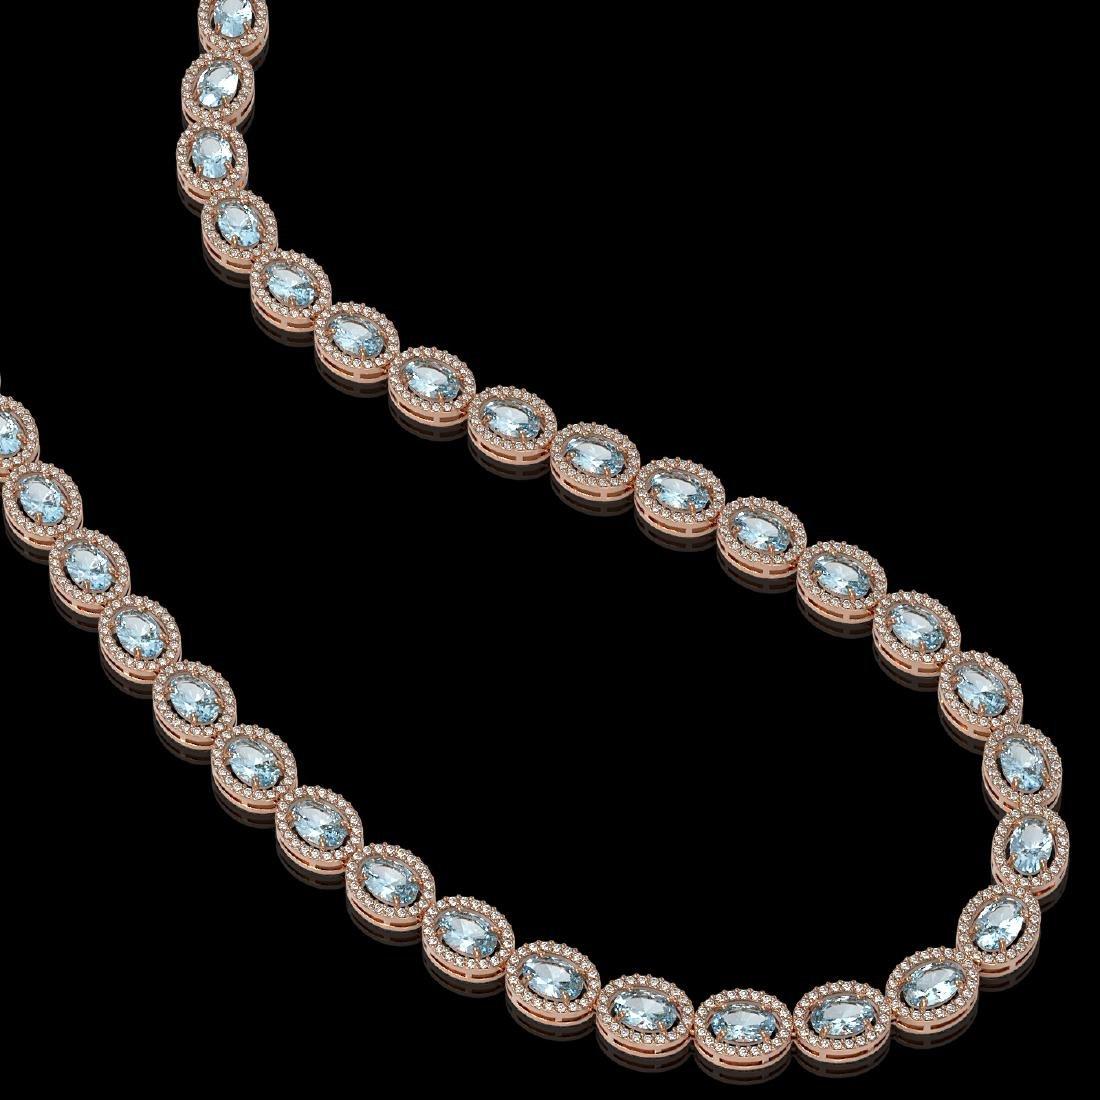 33.25 CTW Sky Topaz & Diamond Halo Necklace 10K Rose - 2